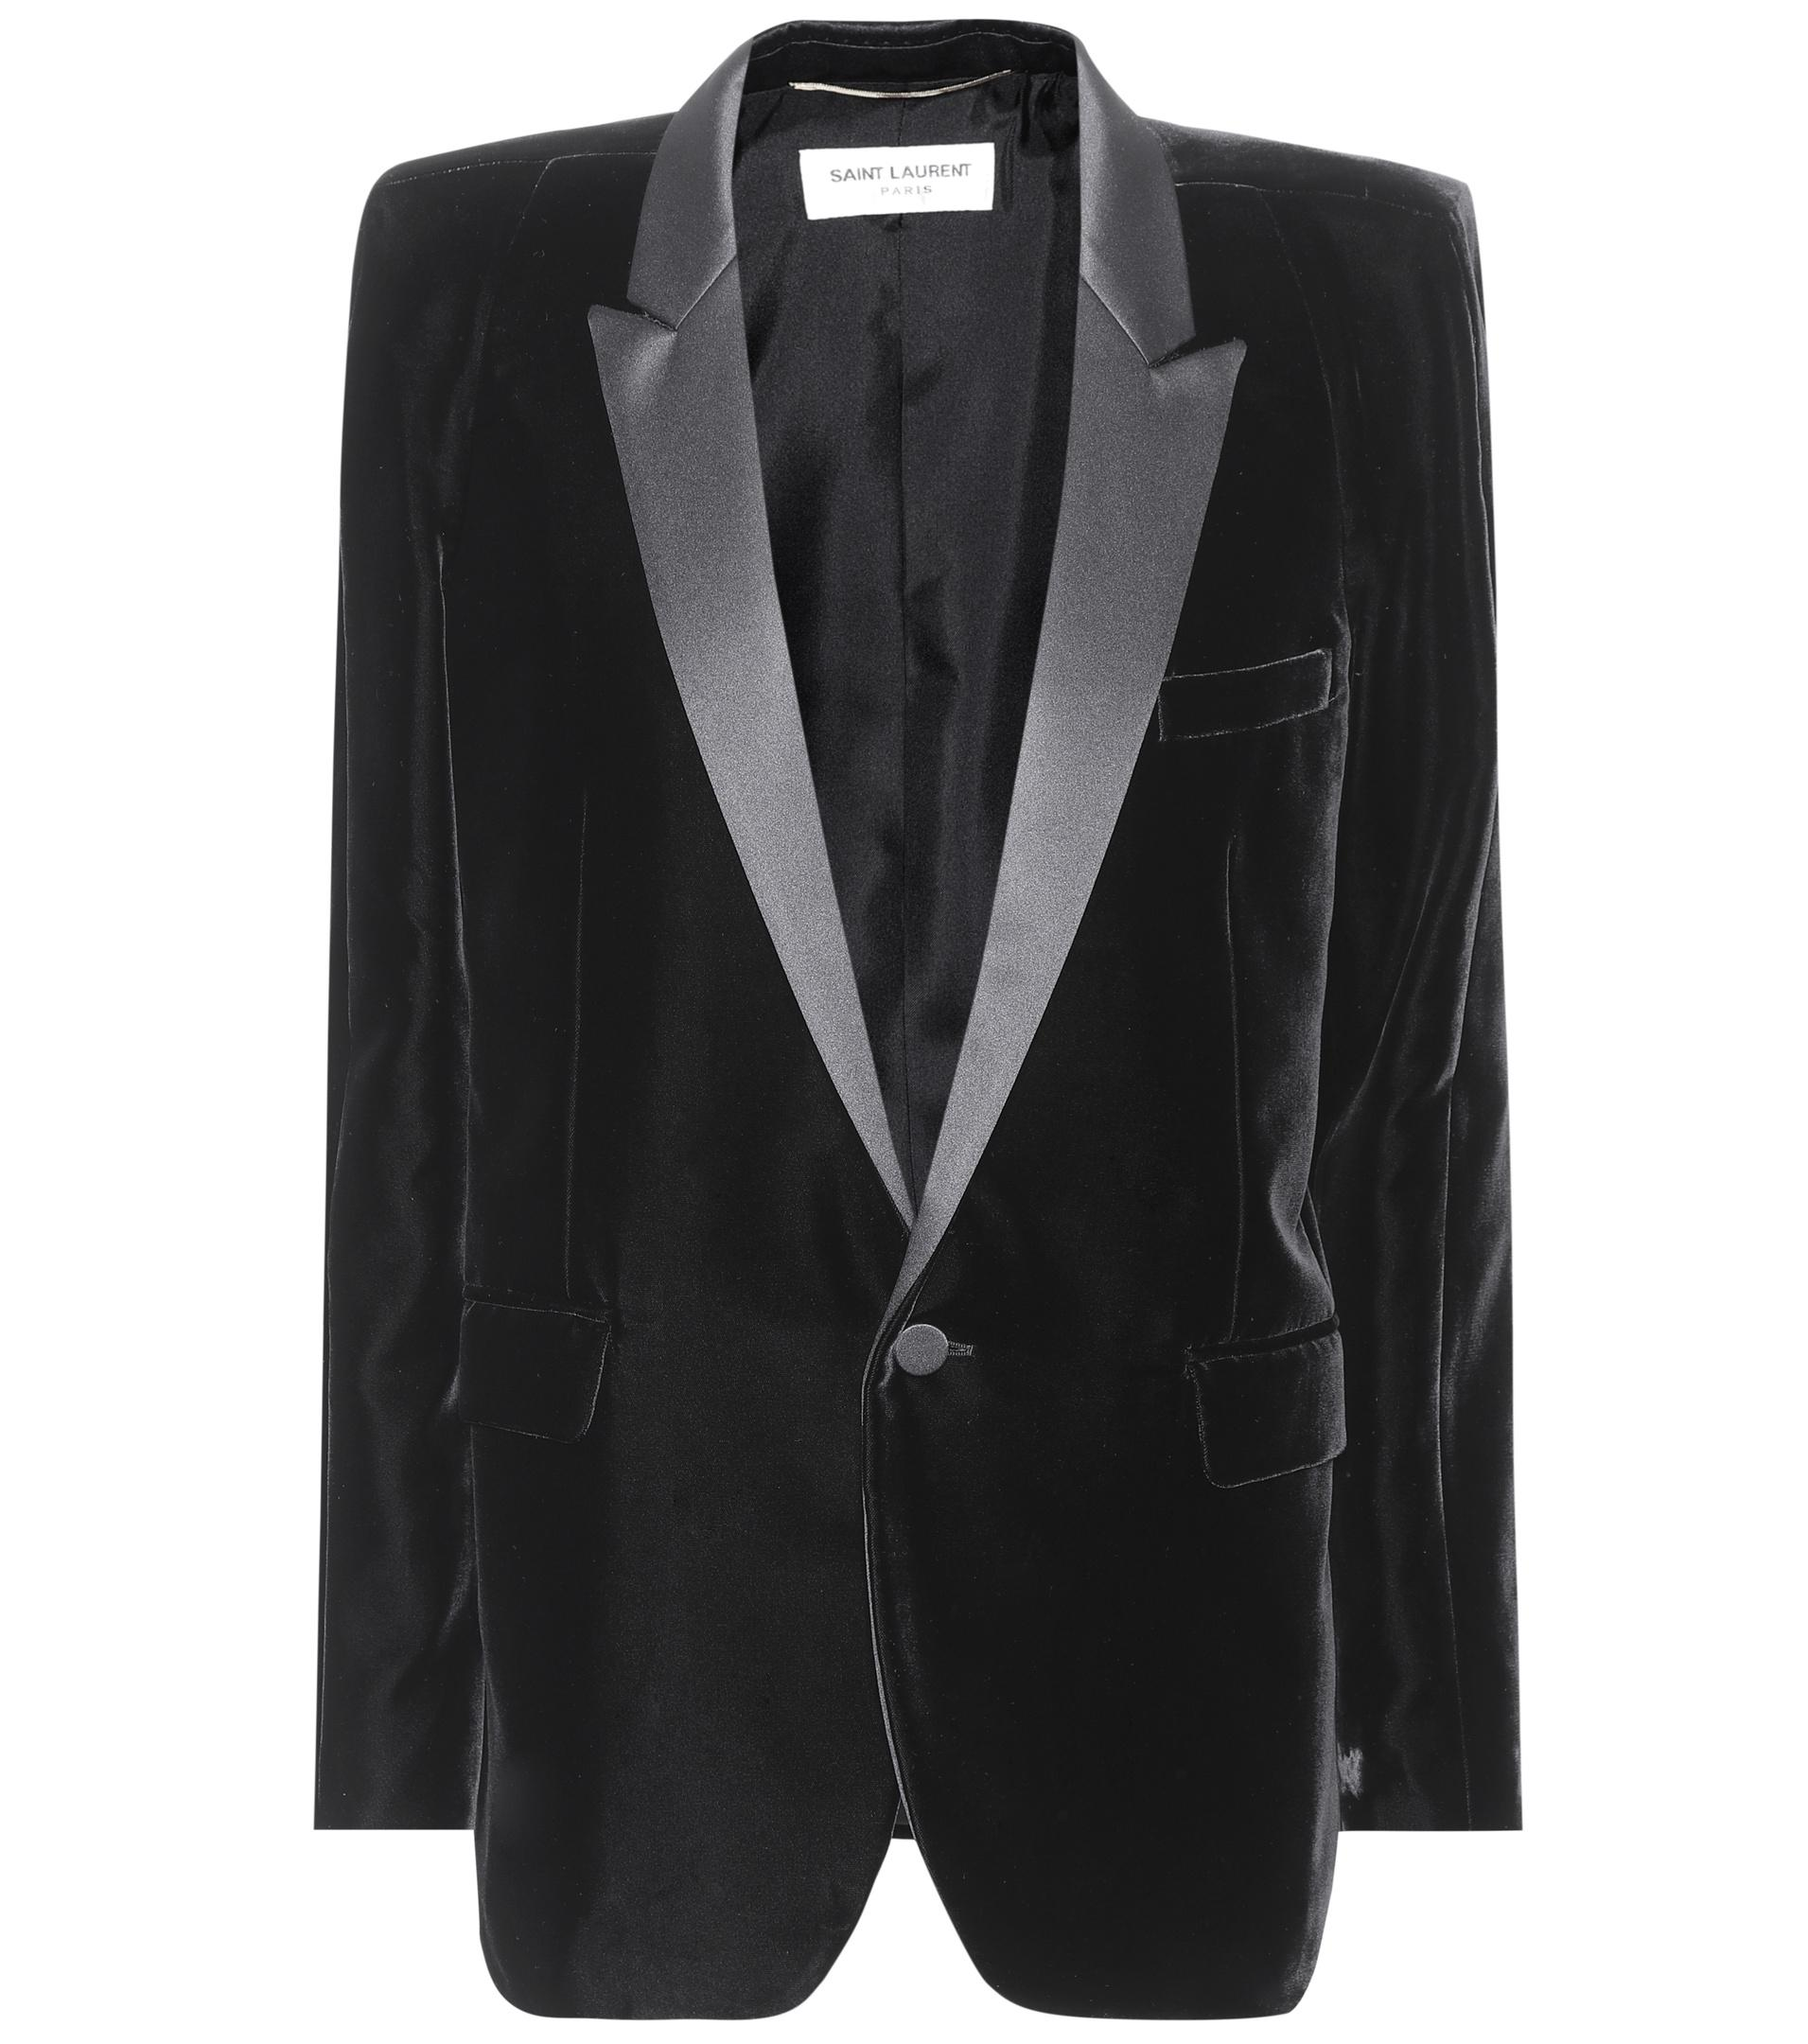 Buy Cheap Geniue Stockist Free Shipping Finishline Saint Laurent velvet tuxedo jacket - Black Professional Sale Online Fashionable Cheap Online RLwNsmNszO